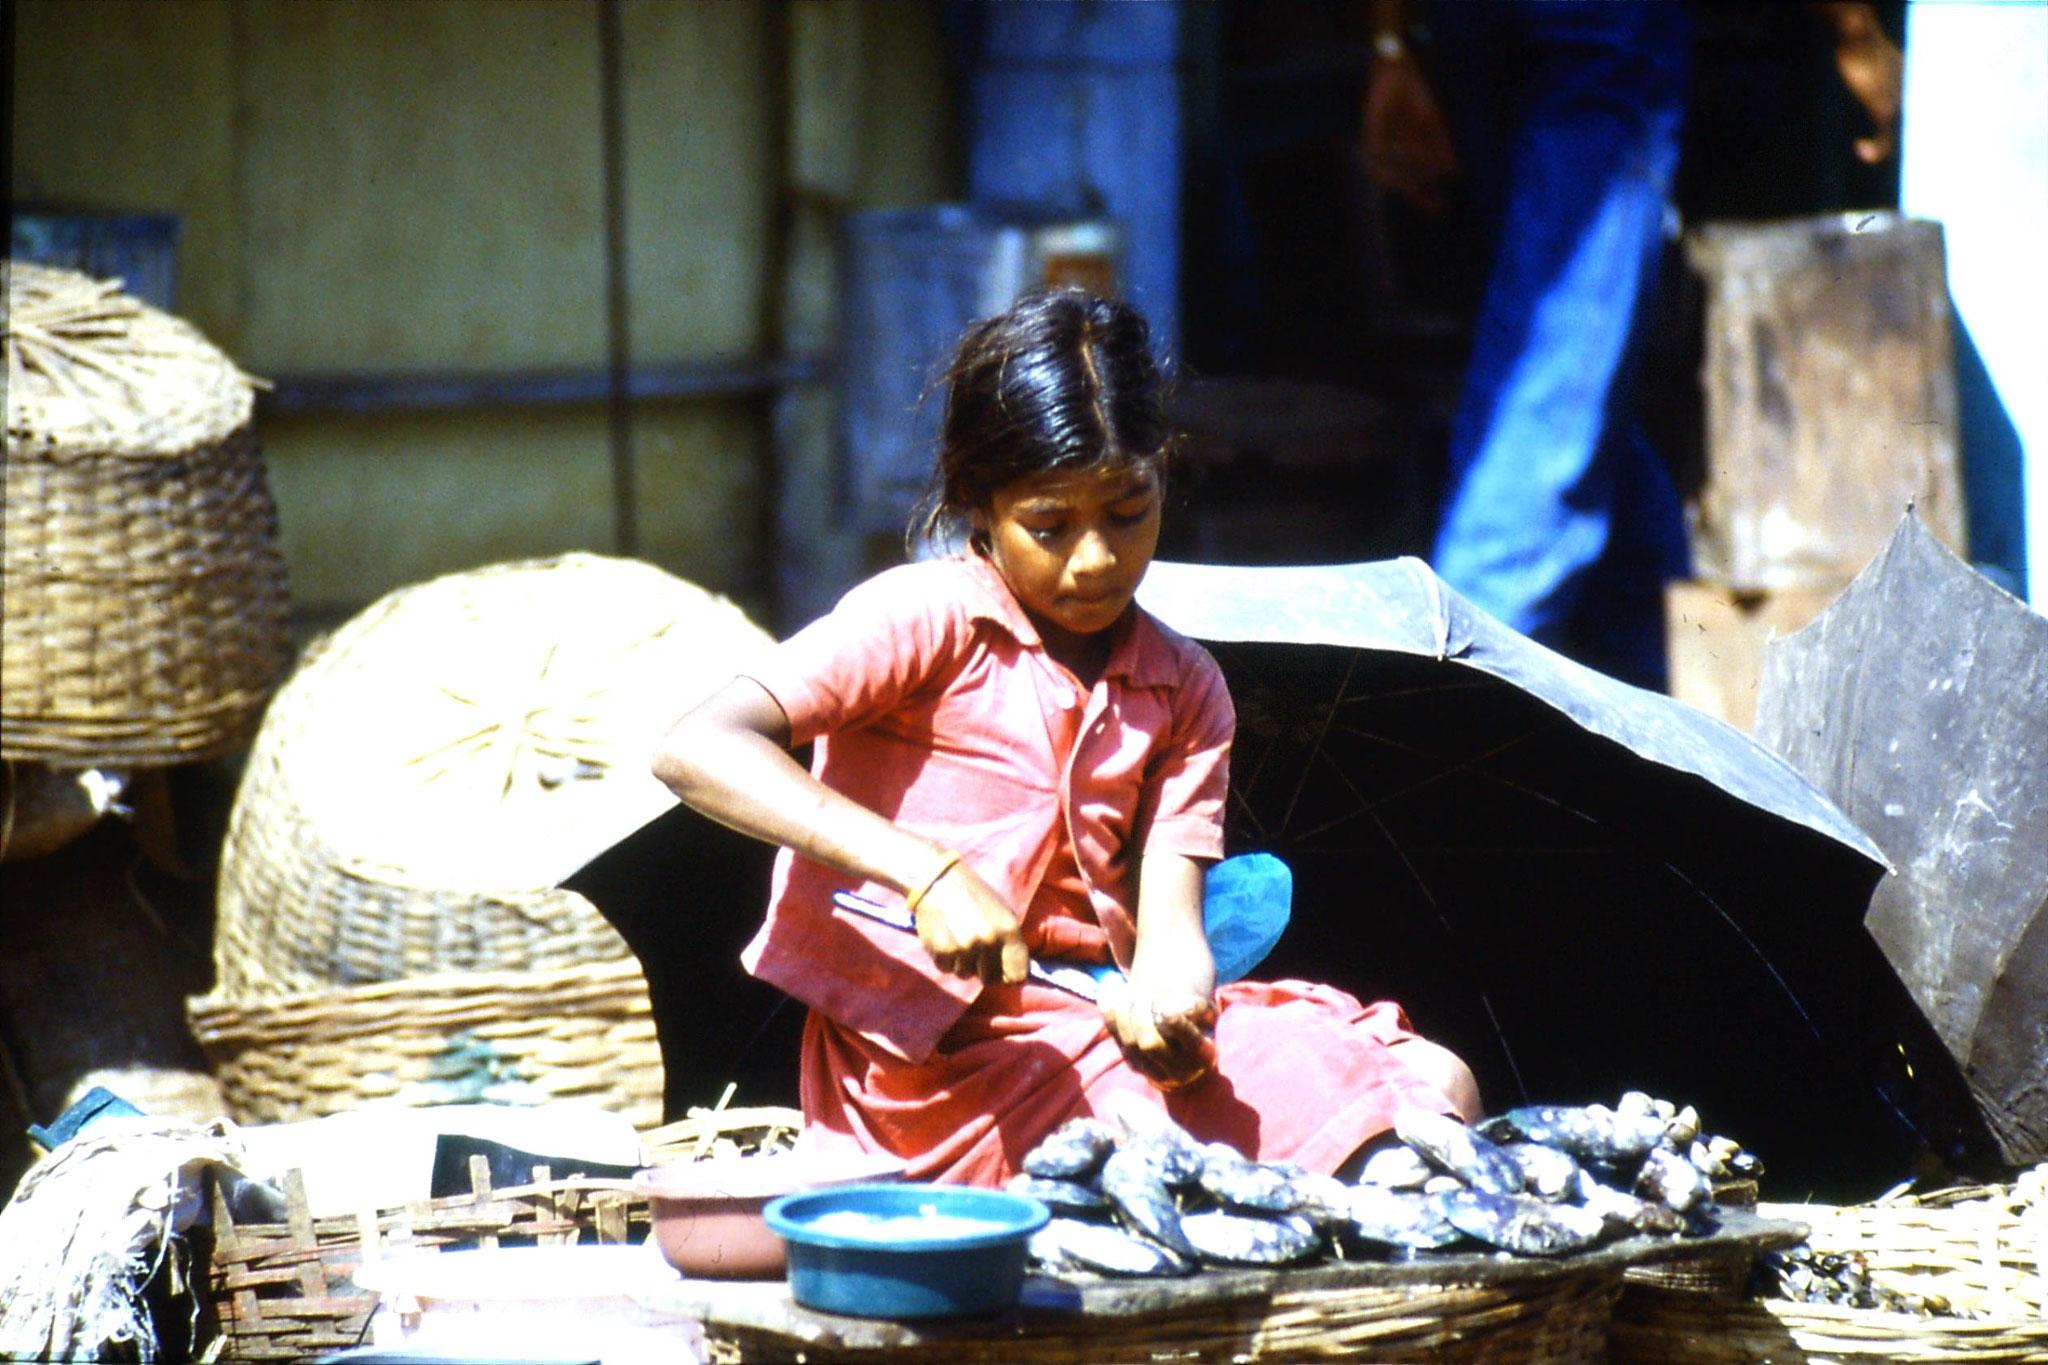 6/1/1990: 6: Mapusa market girl preparing shell fish